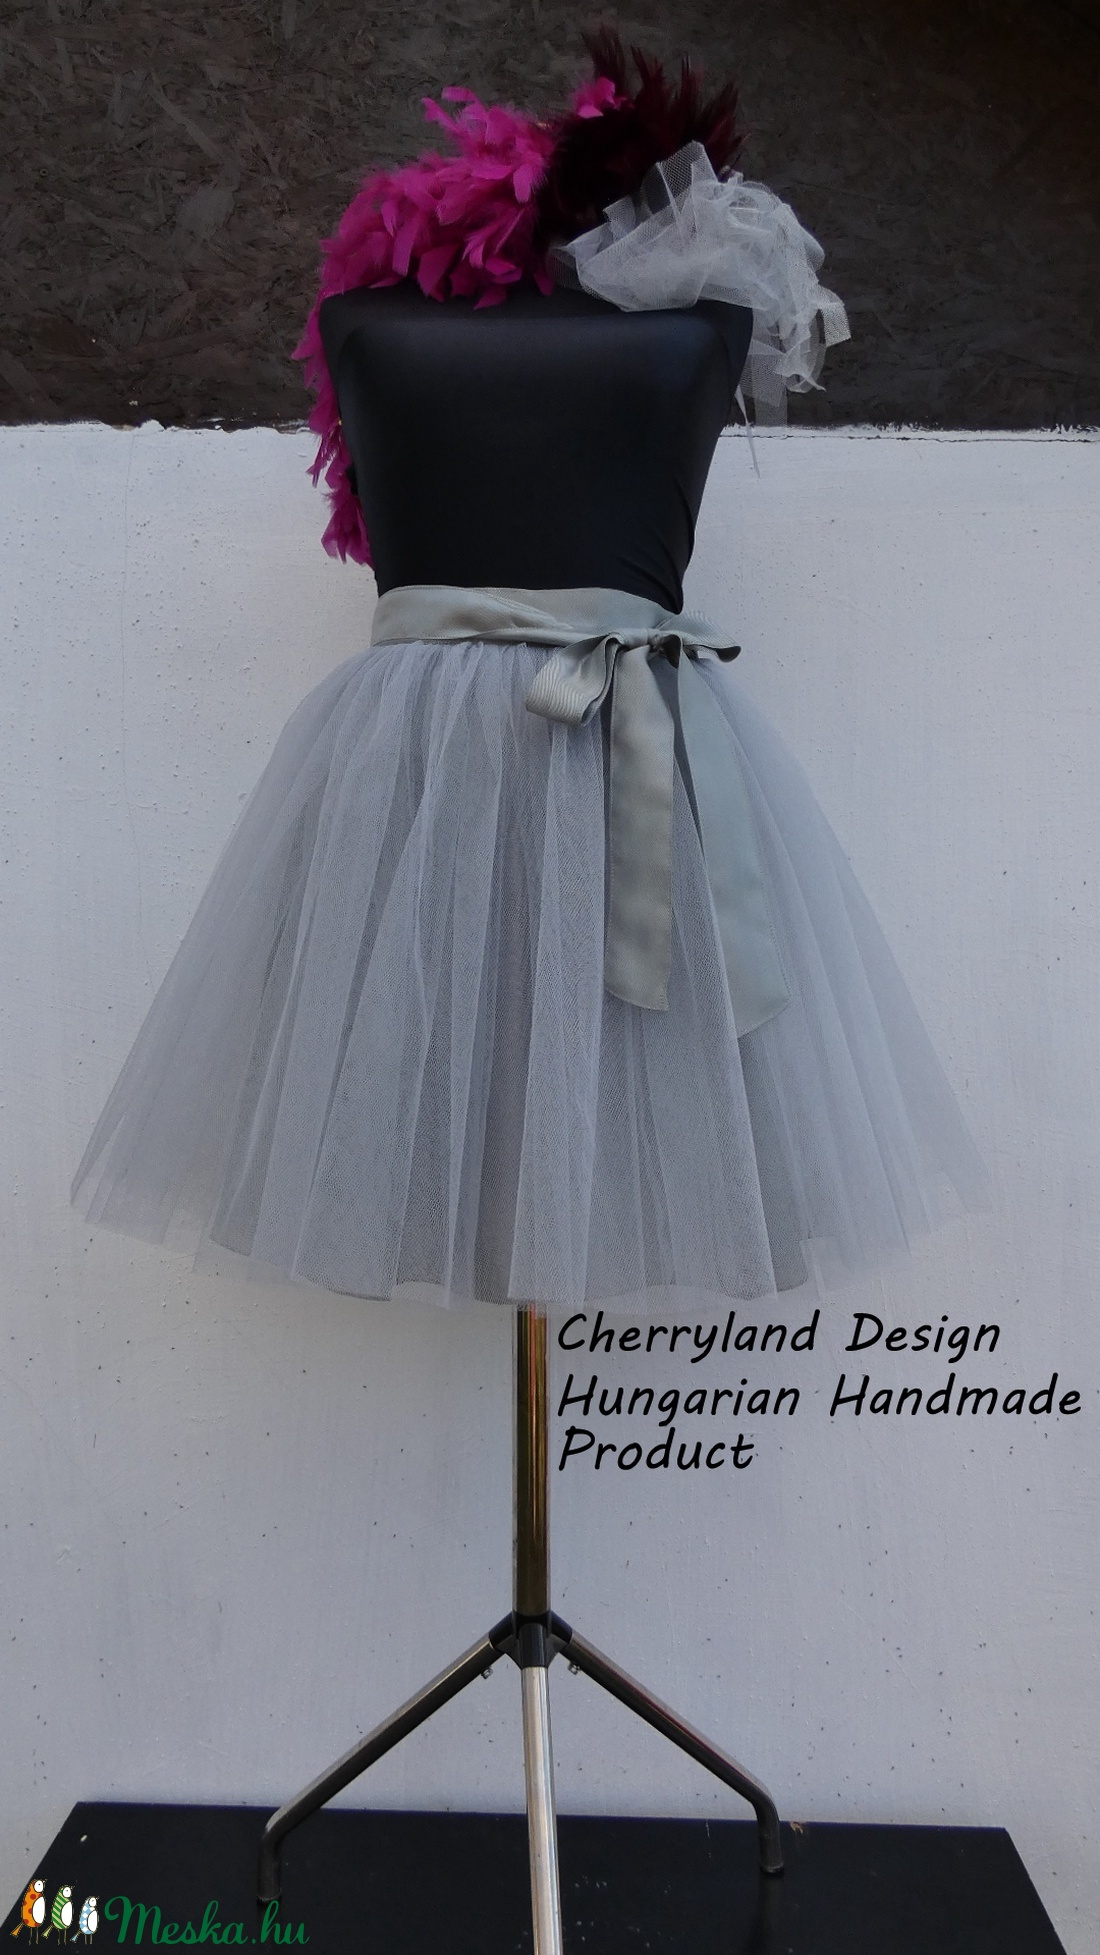 Cherryland Design Szürke  Tüll Szoknya /Grey Tulle Skirt - Meska.hu